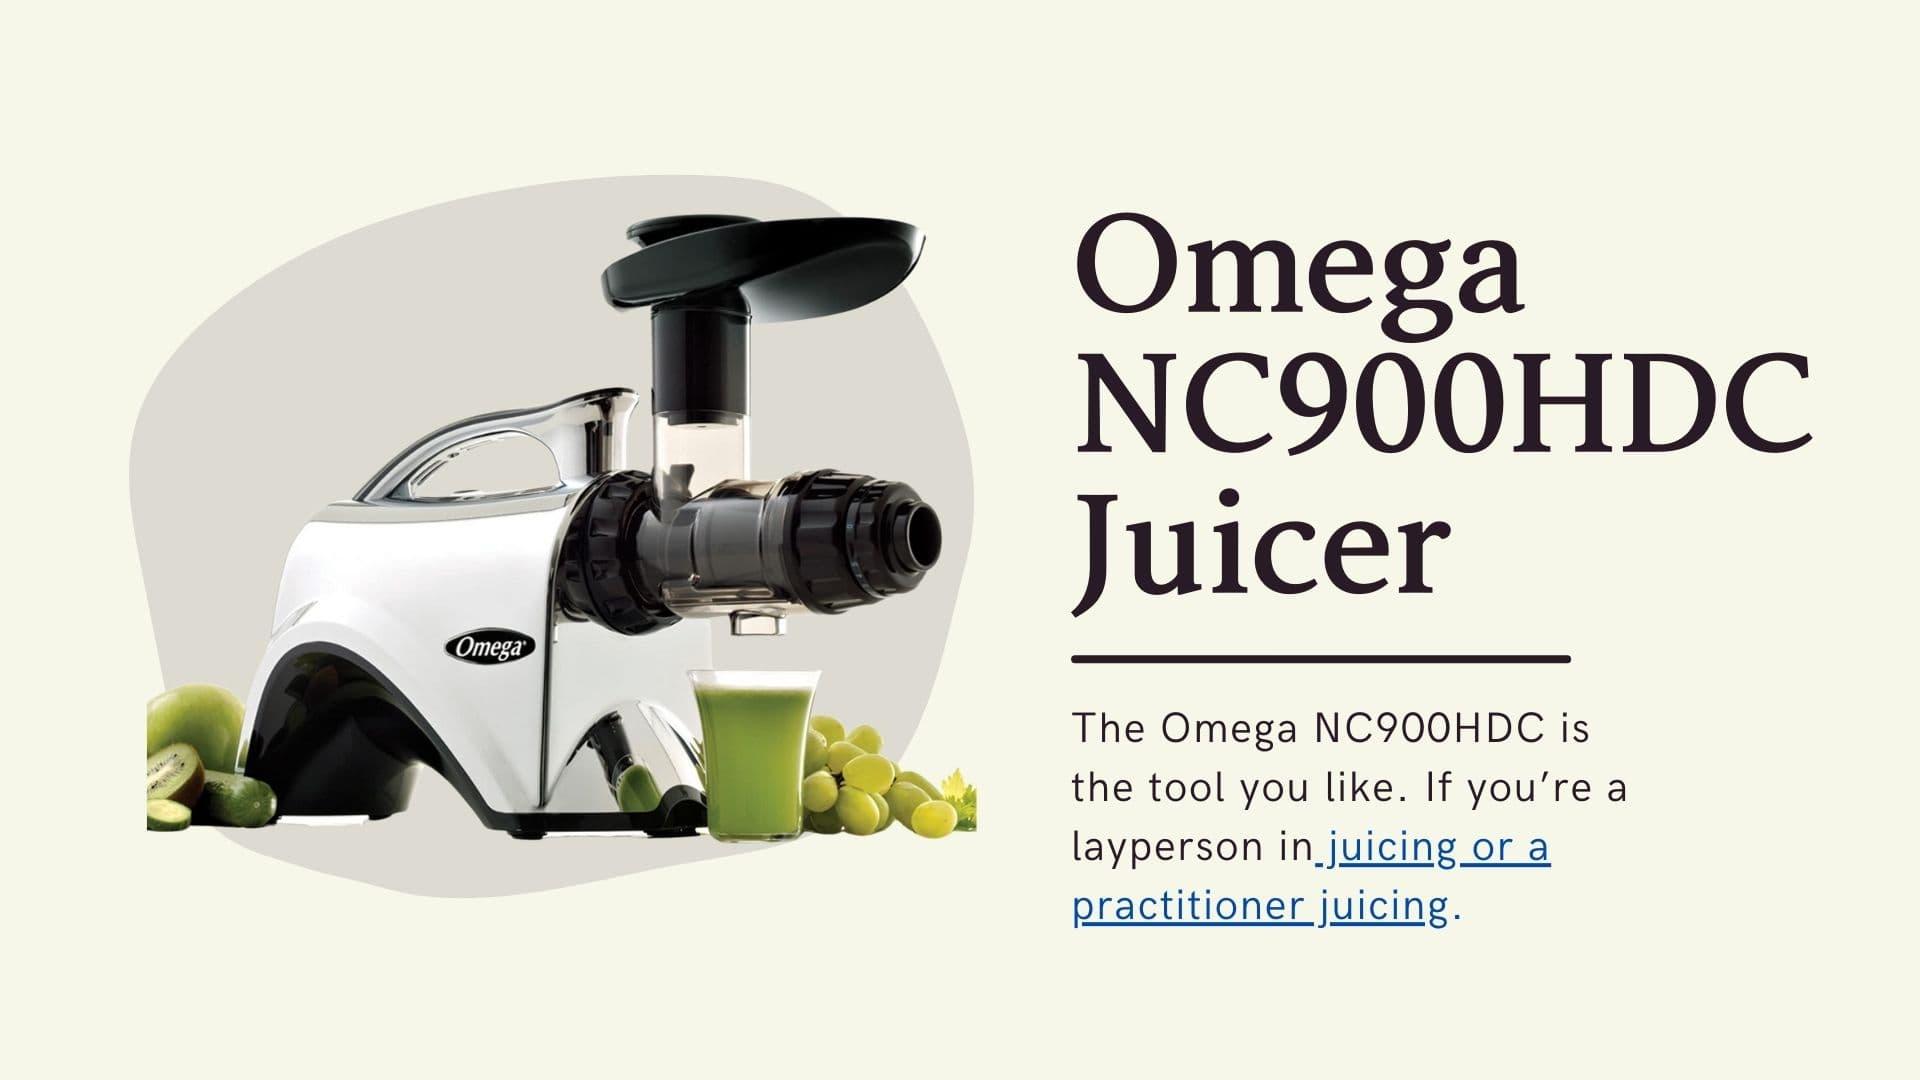 Omega NC900HDC Juicer